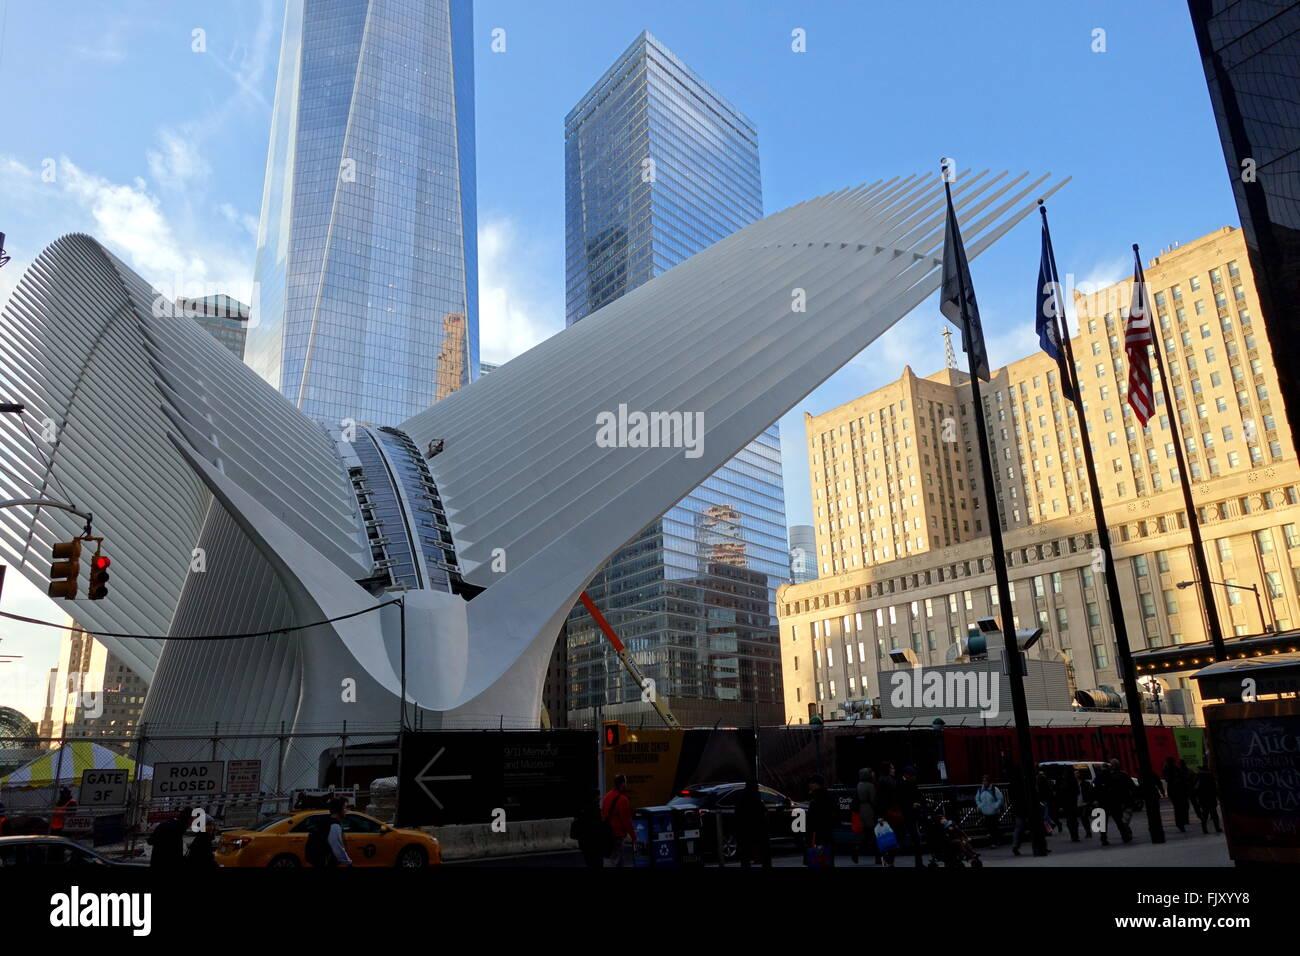 World Trade Center Oculus Und Freedom Tower In New York City Ny